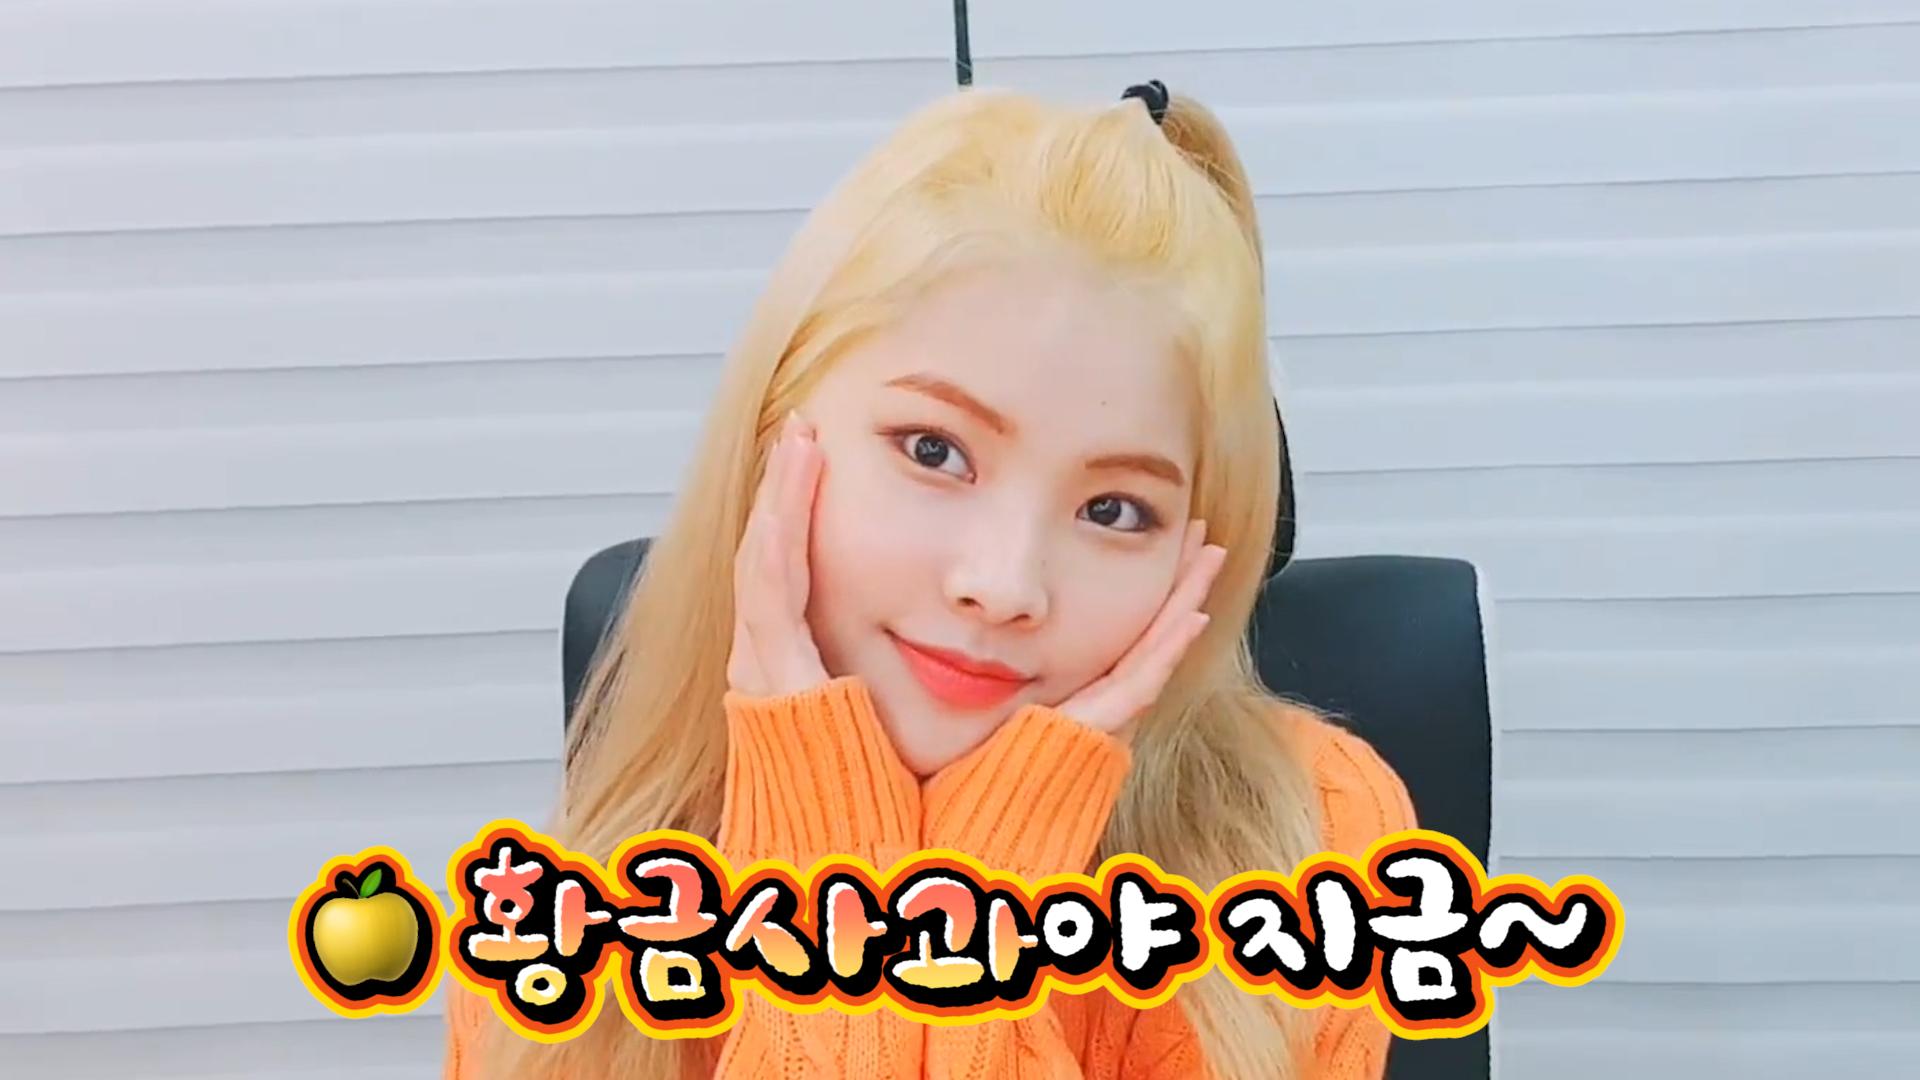 [Weki Meki] 누르지마세요 초인종이 아닙니다 말랑깜찍황금사과입니다💛✨ (RINA showing her cute hair style)